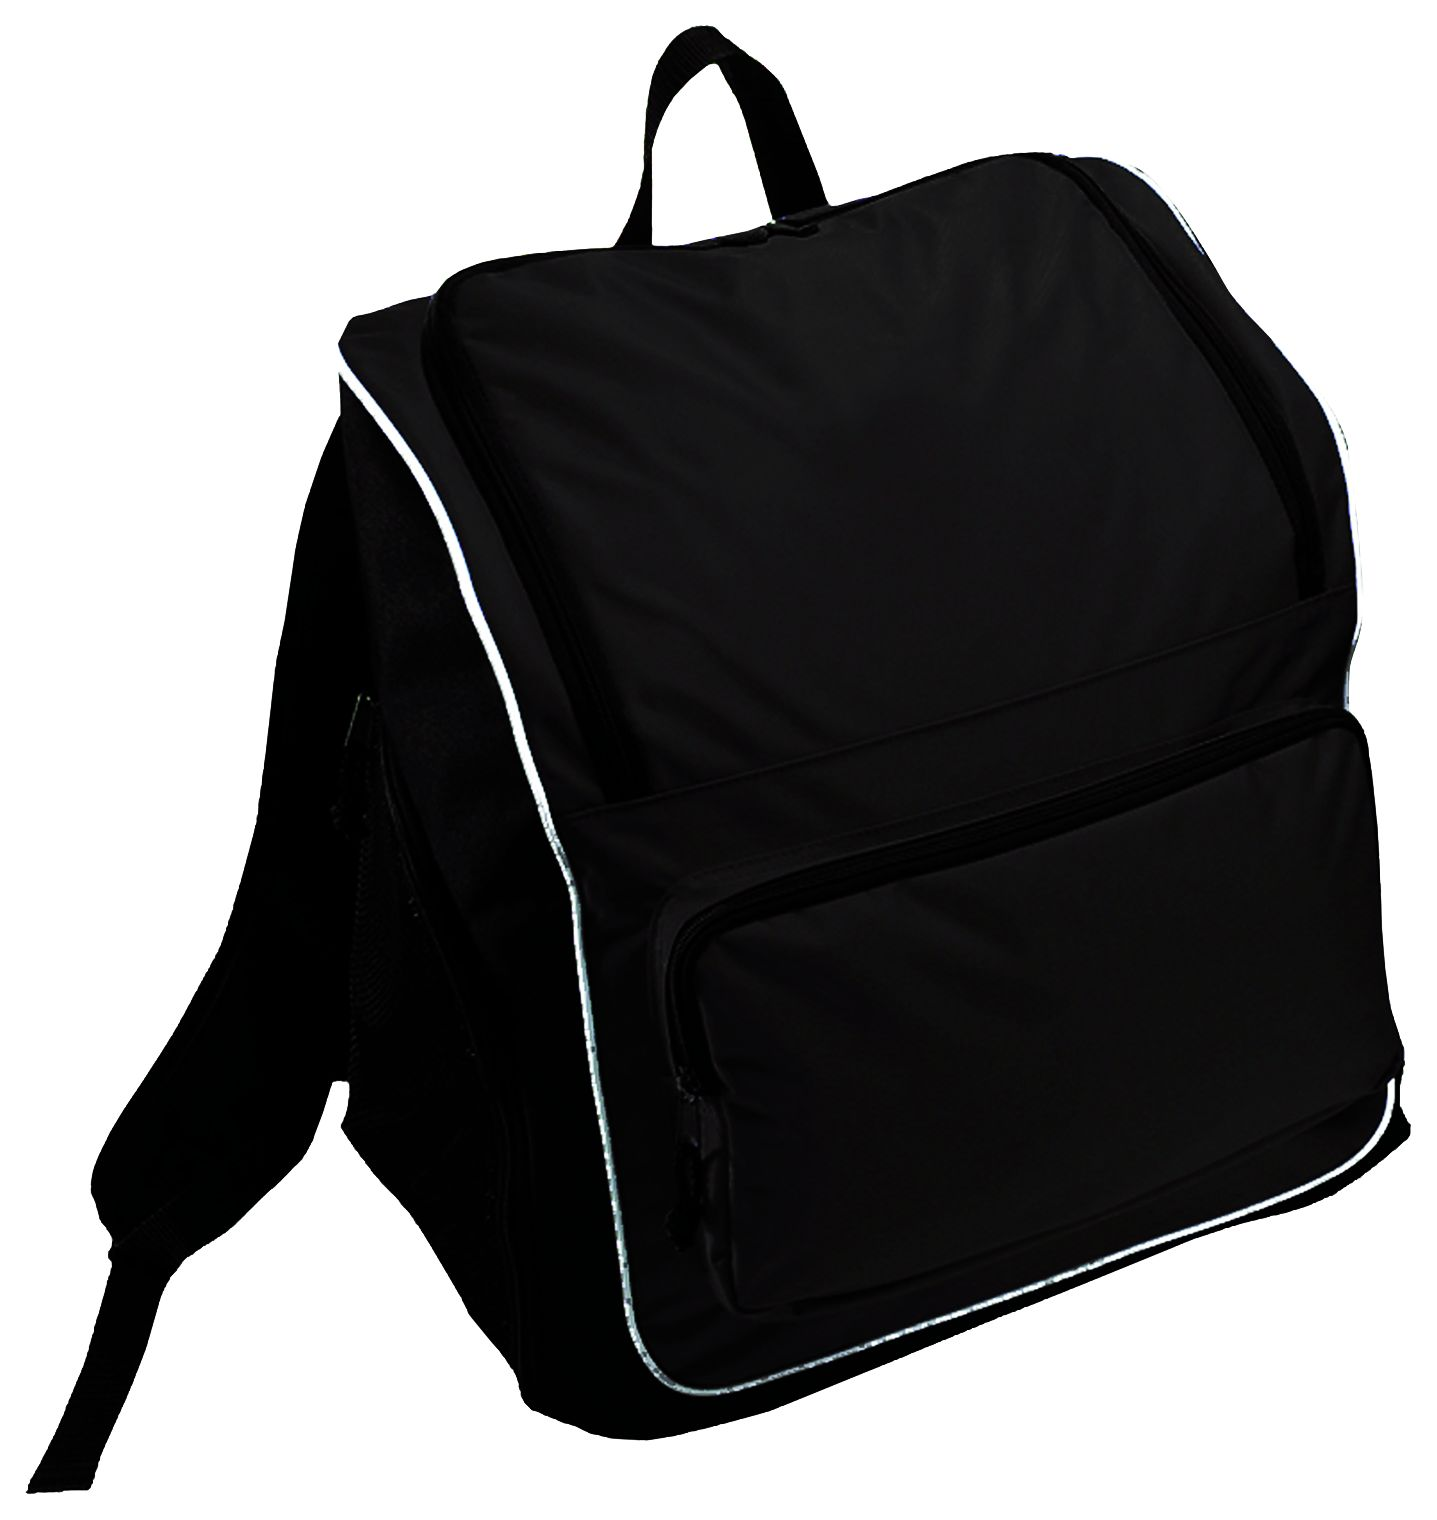 Sportsman Backpack Bag - BLACK/BLACK/WHITE